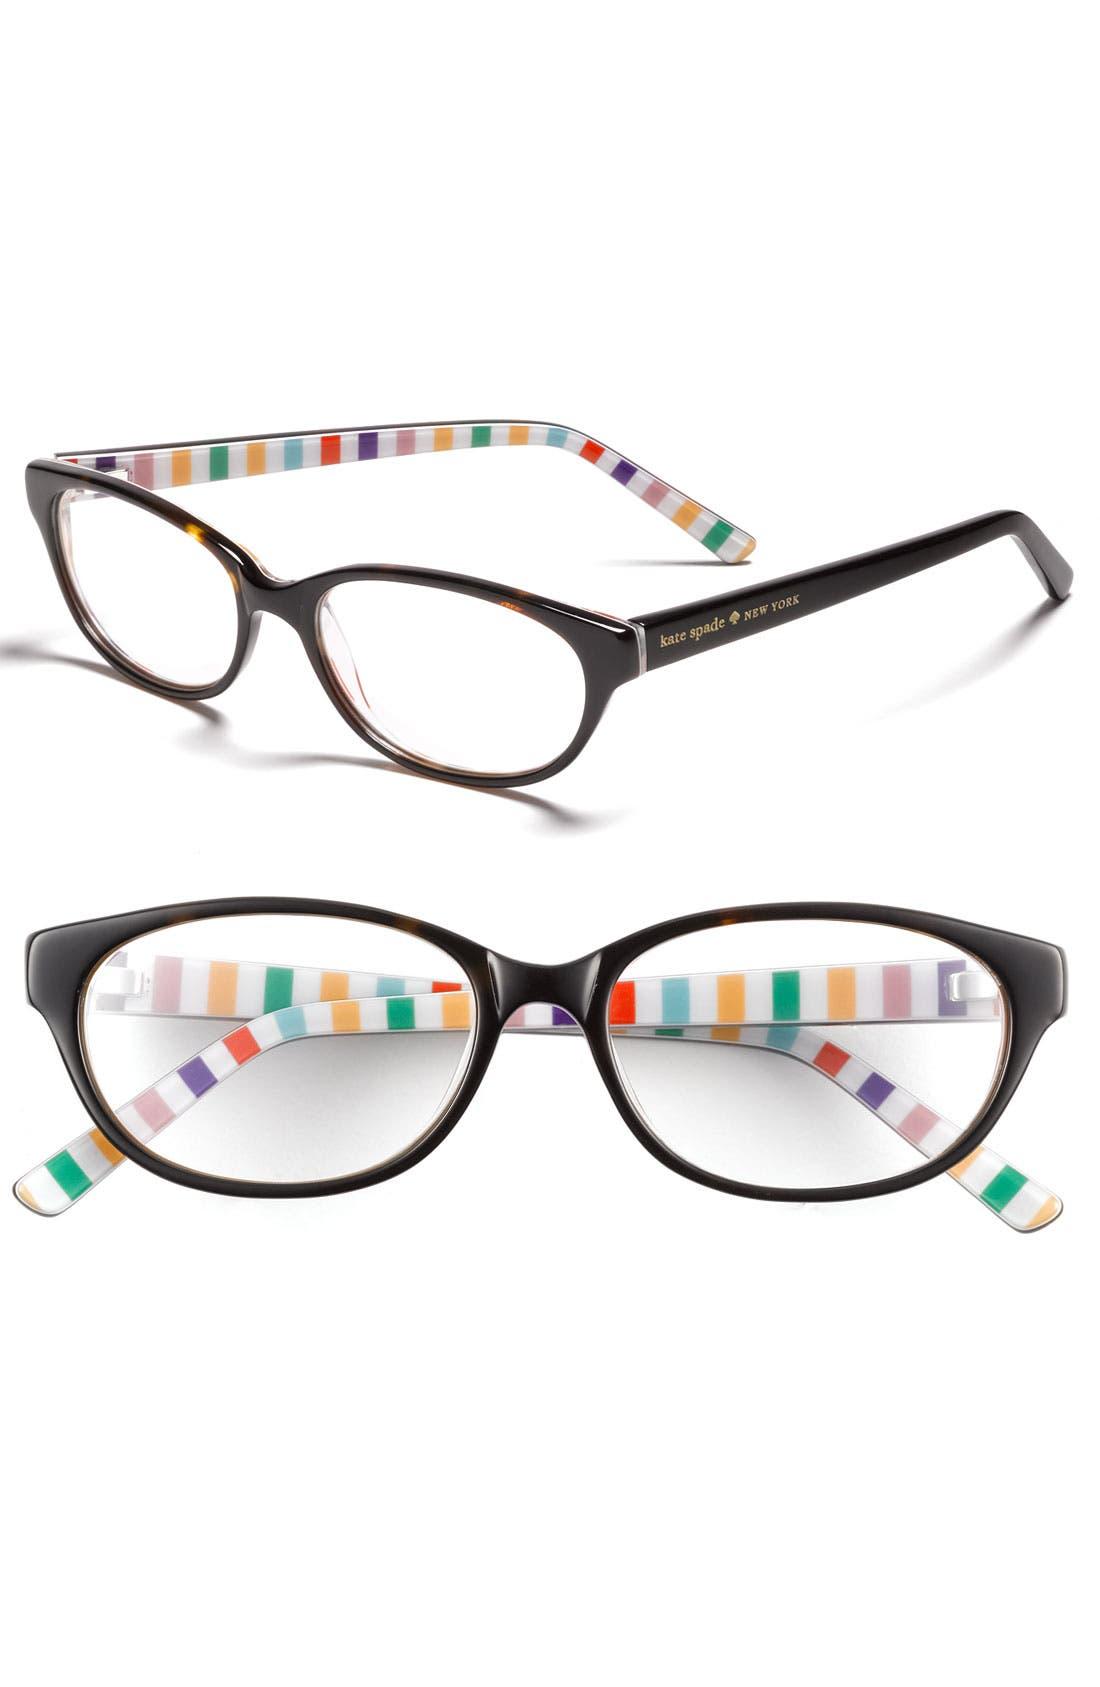 Alternate Image 1 Selected - kate spade new york 'charity' reading glasses (2 for $88)